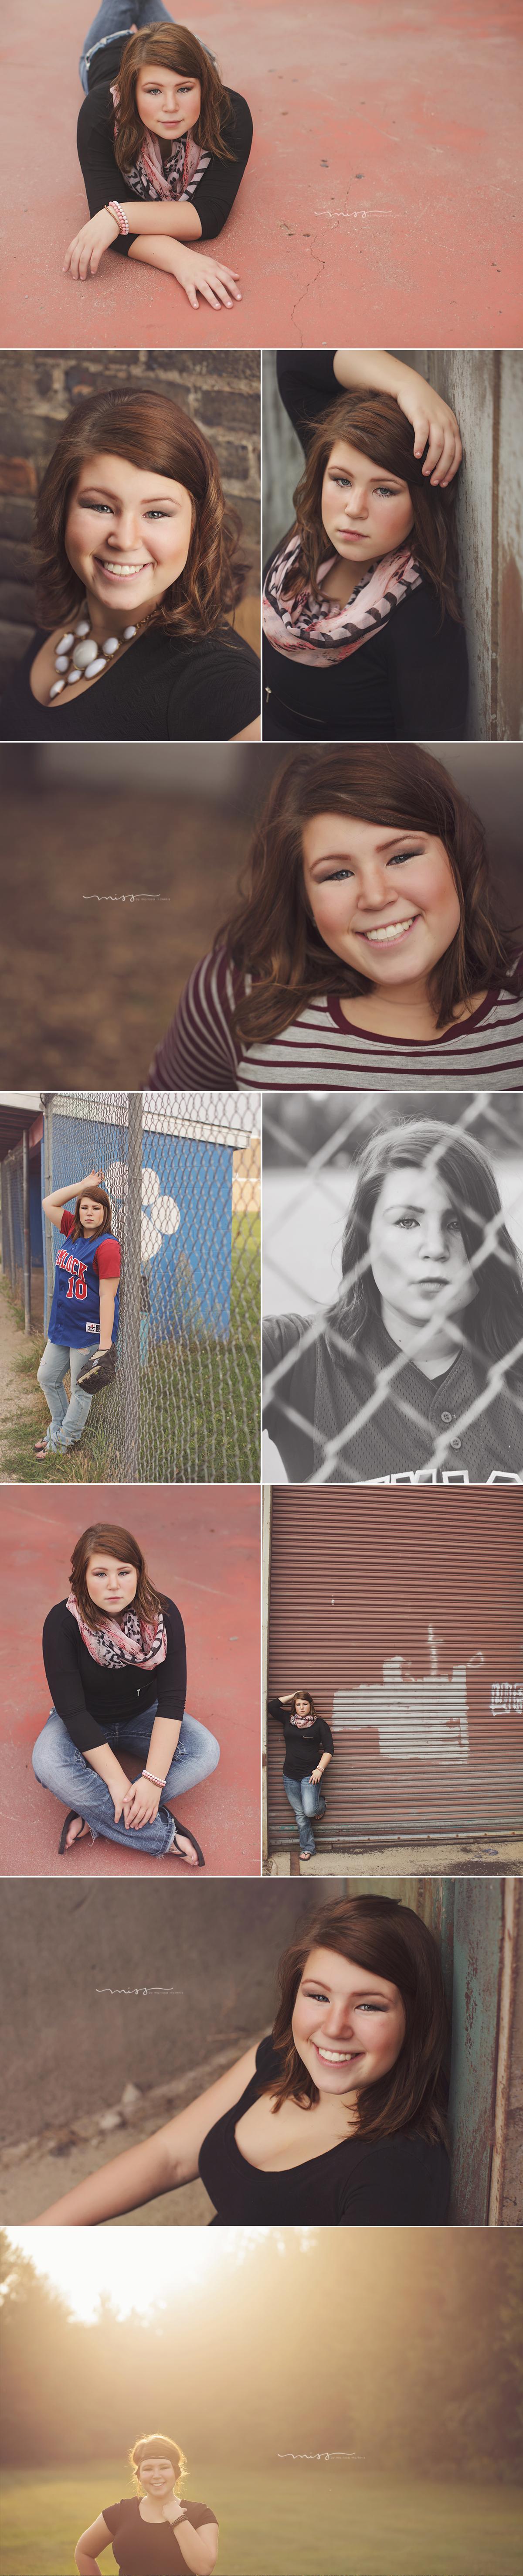 Michigan Senior Photographer | Amy Hemlock High School 1